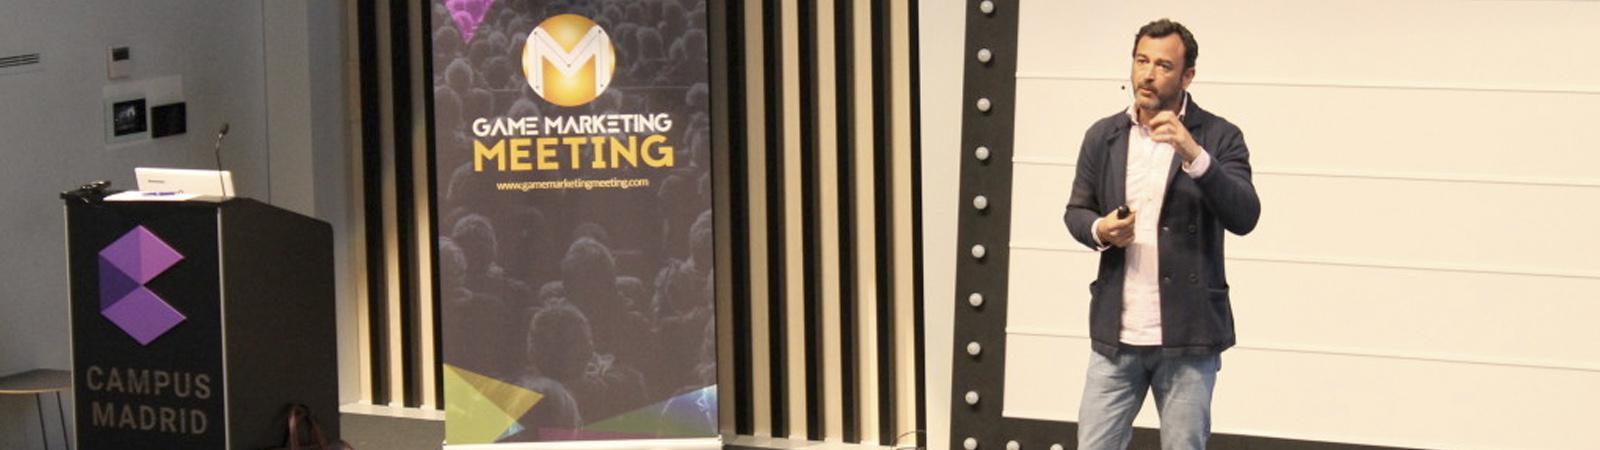 Game Marketing Meeting Campus Madrid